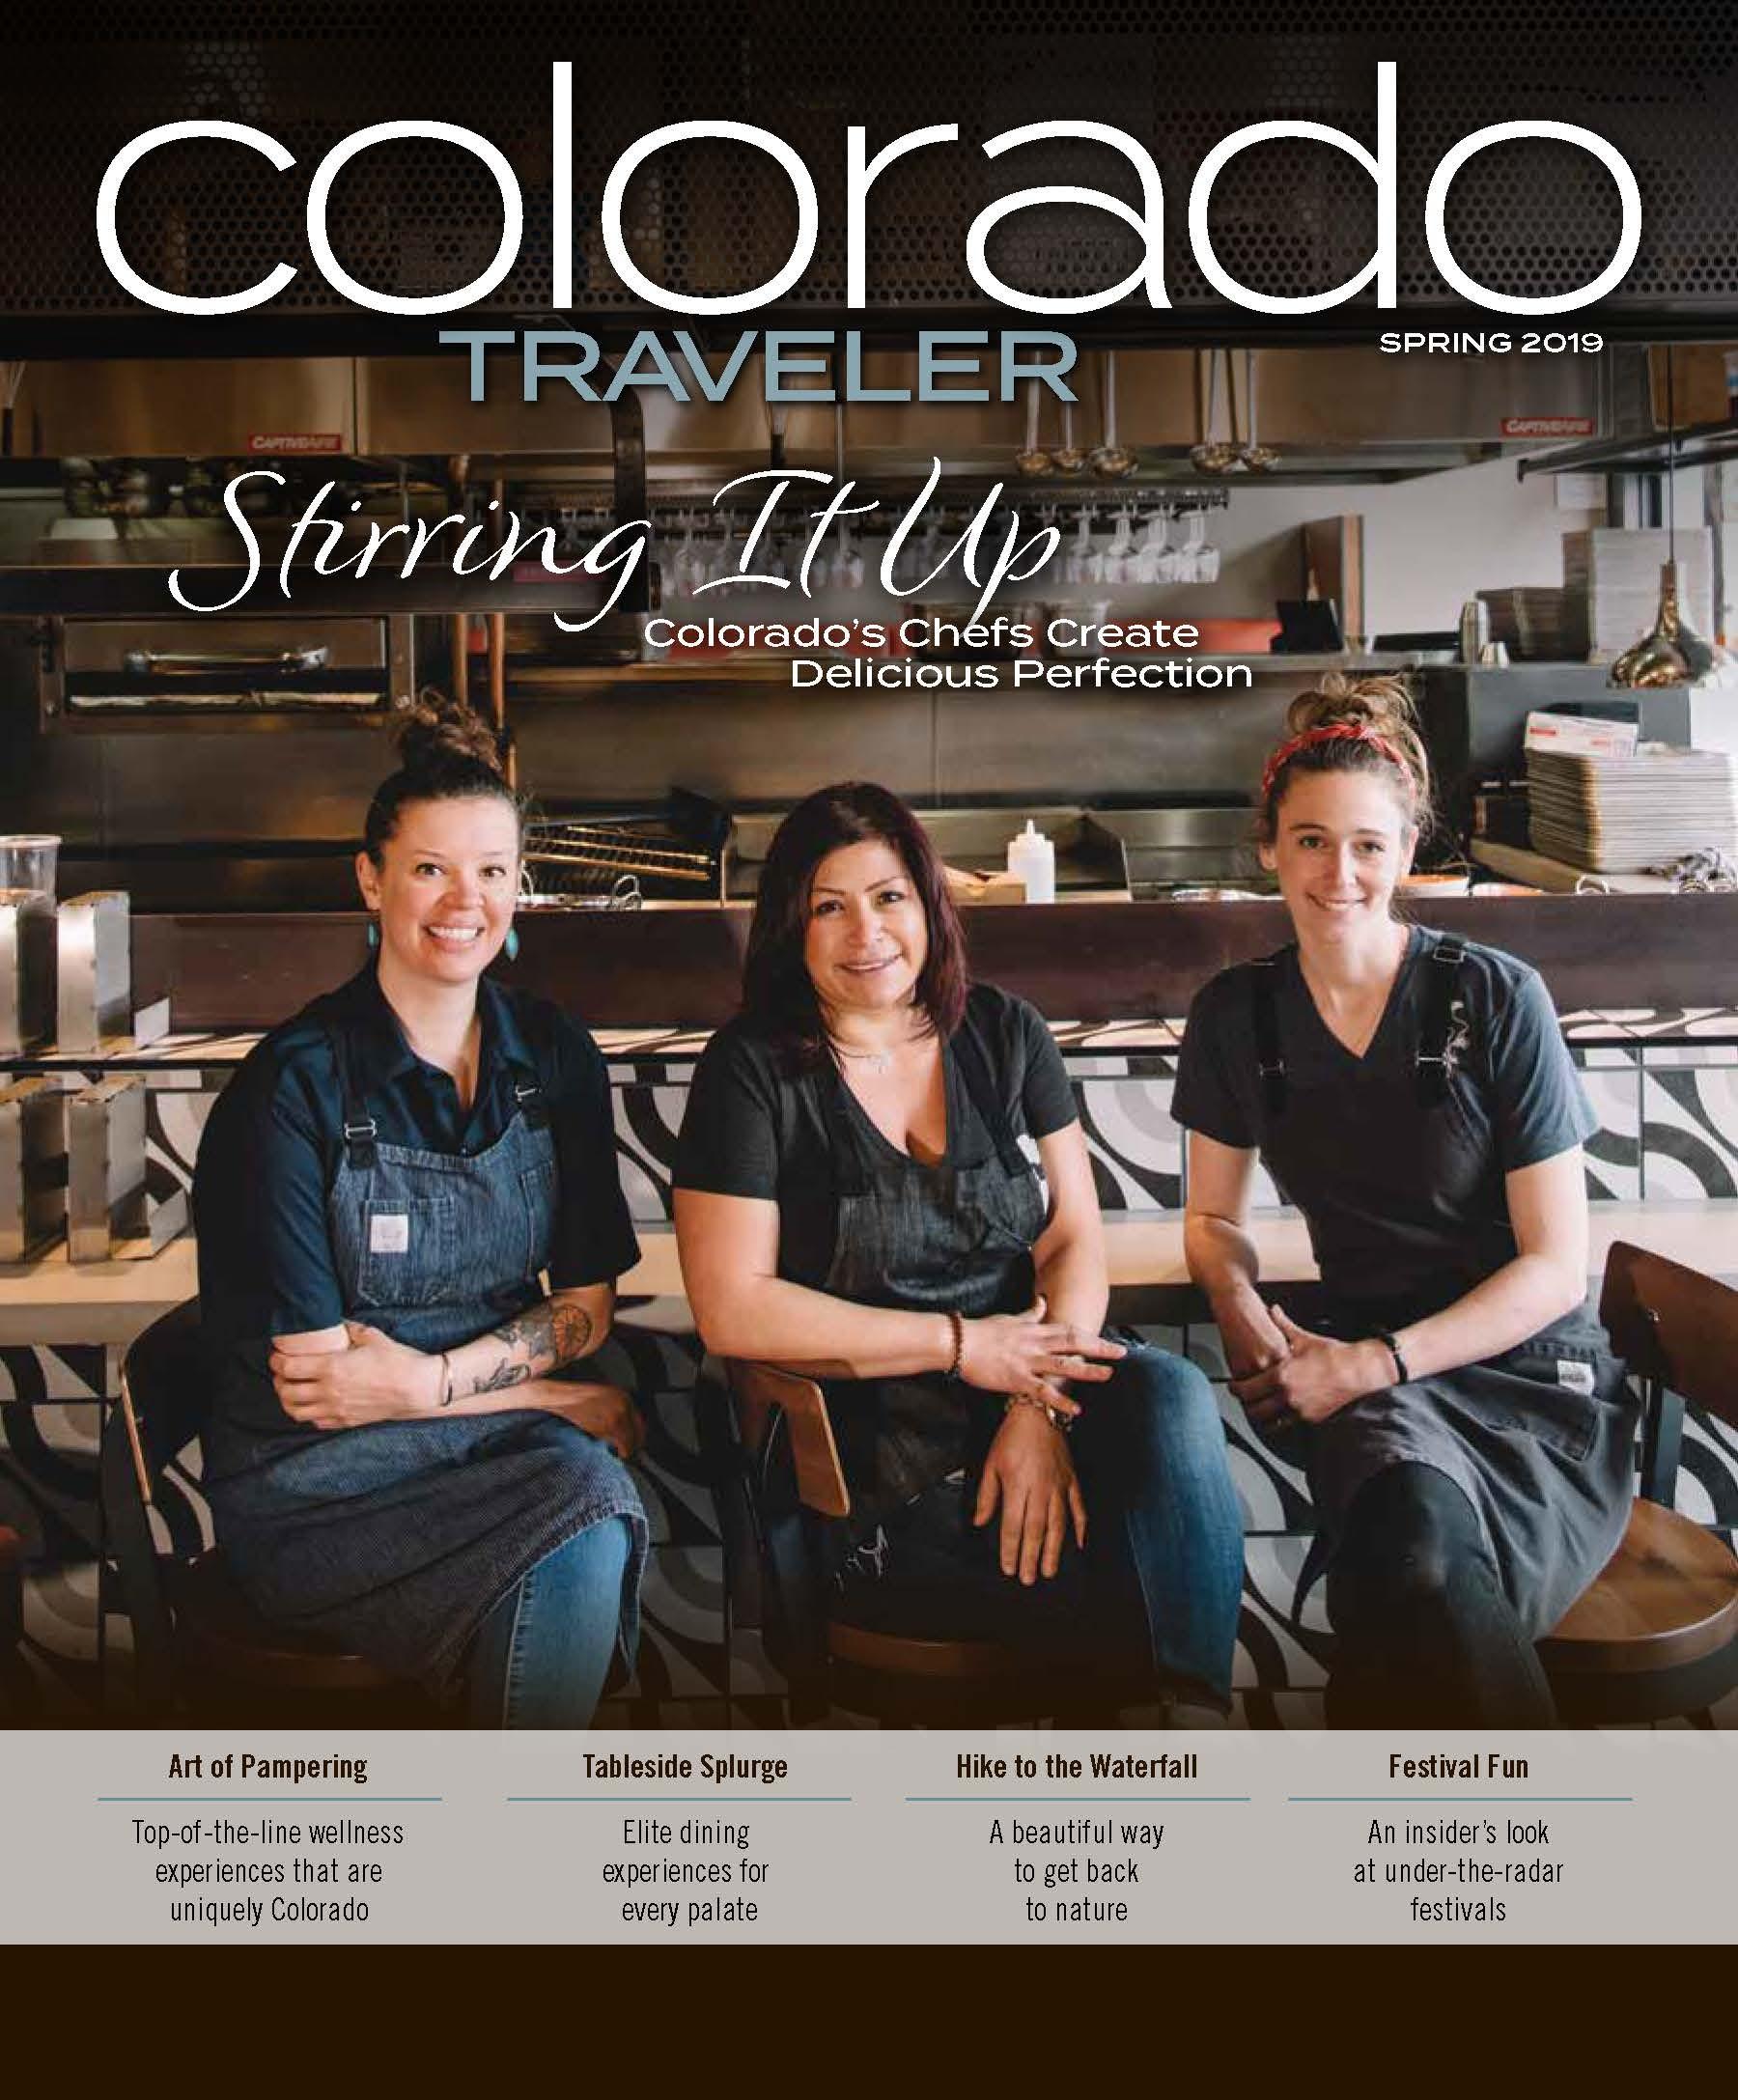 Colorado Traveler Magazine | LinkedIn